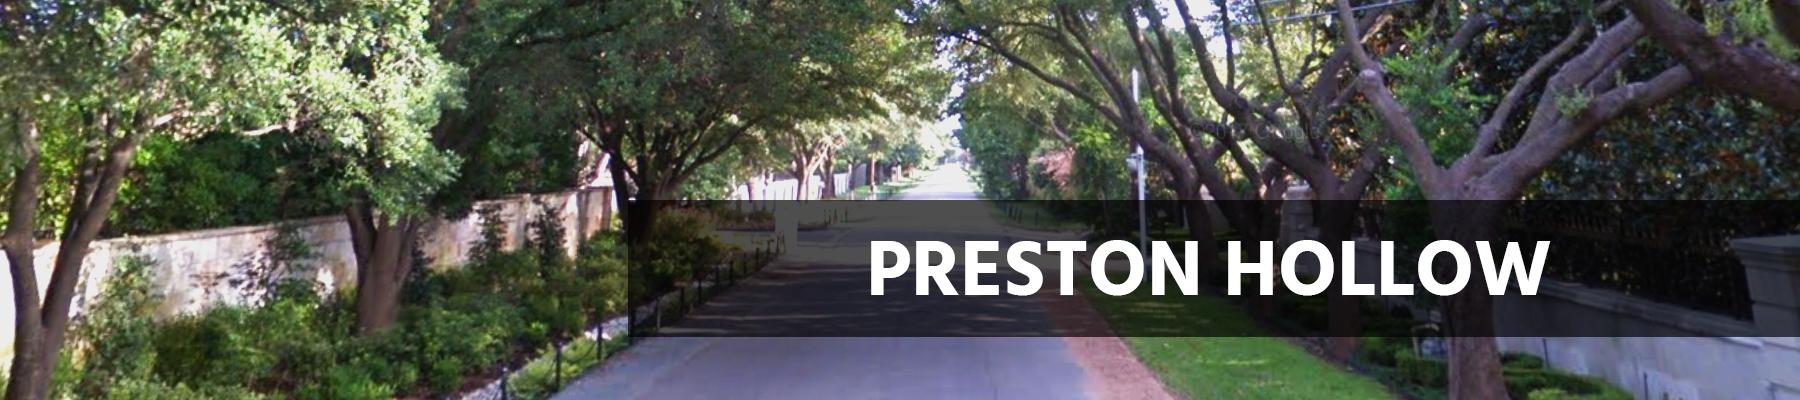 Preston Hollow_1.png